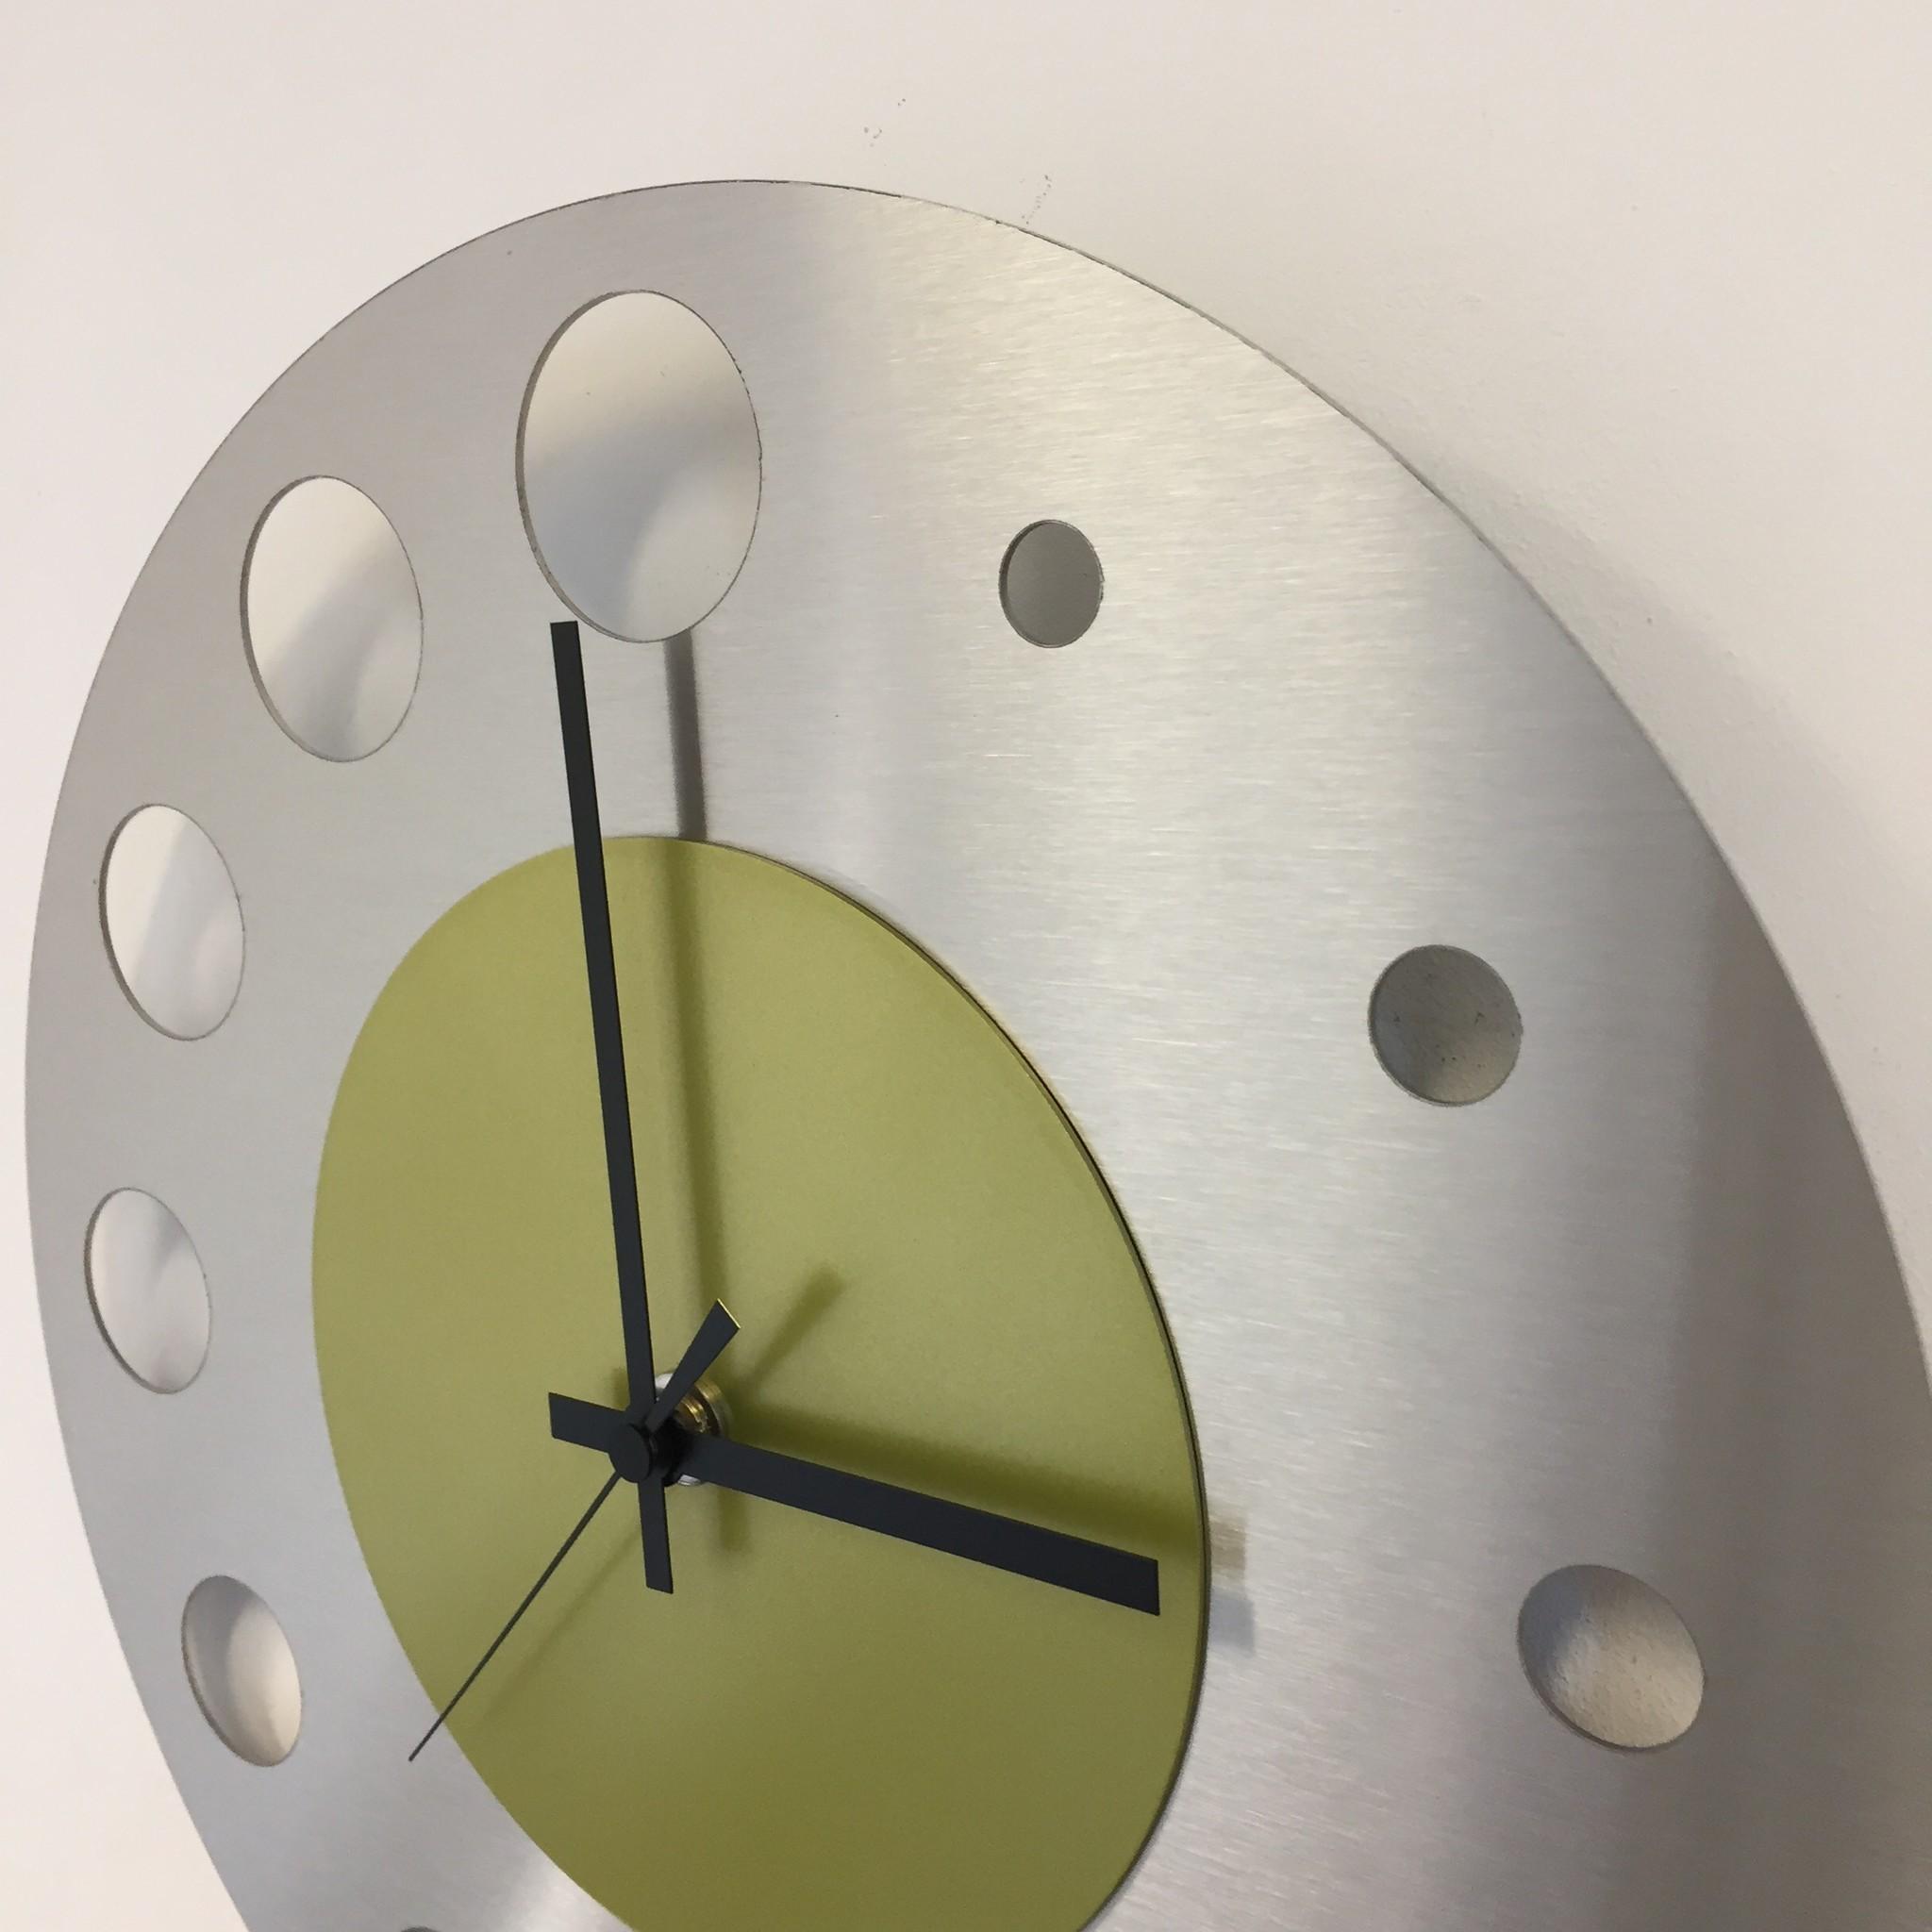 ChantalBrandO Wandklok JUNTE BRUSSEL ATOMIUM LIME GREEN Modern Design